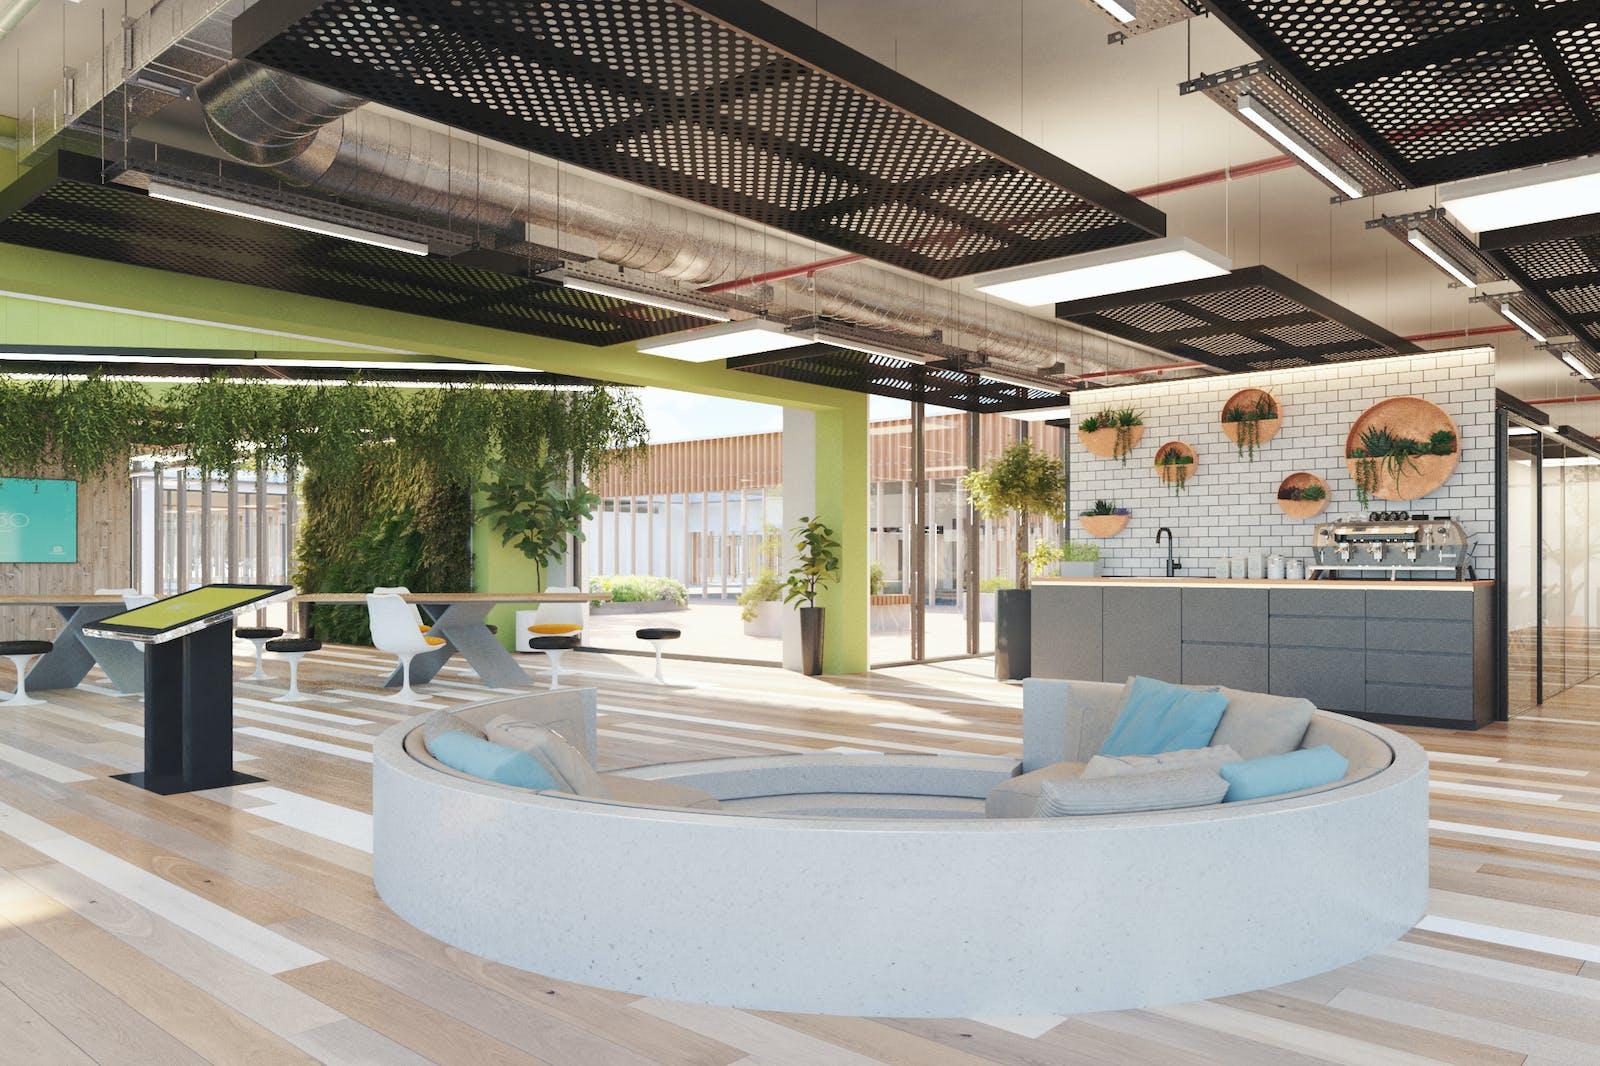 GU30, Lynchborough Road, Liphook, Office To Let / For Sale - GU30_Reception v2.jpg